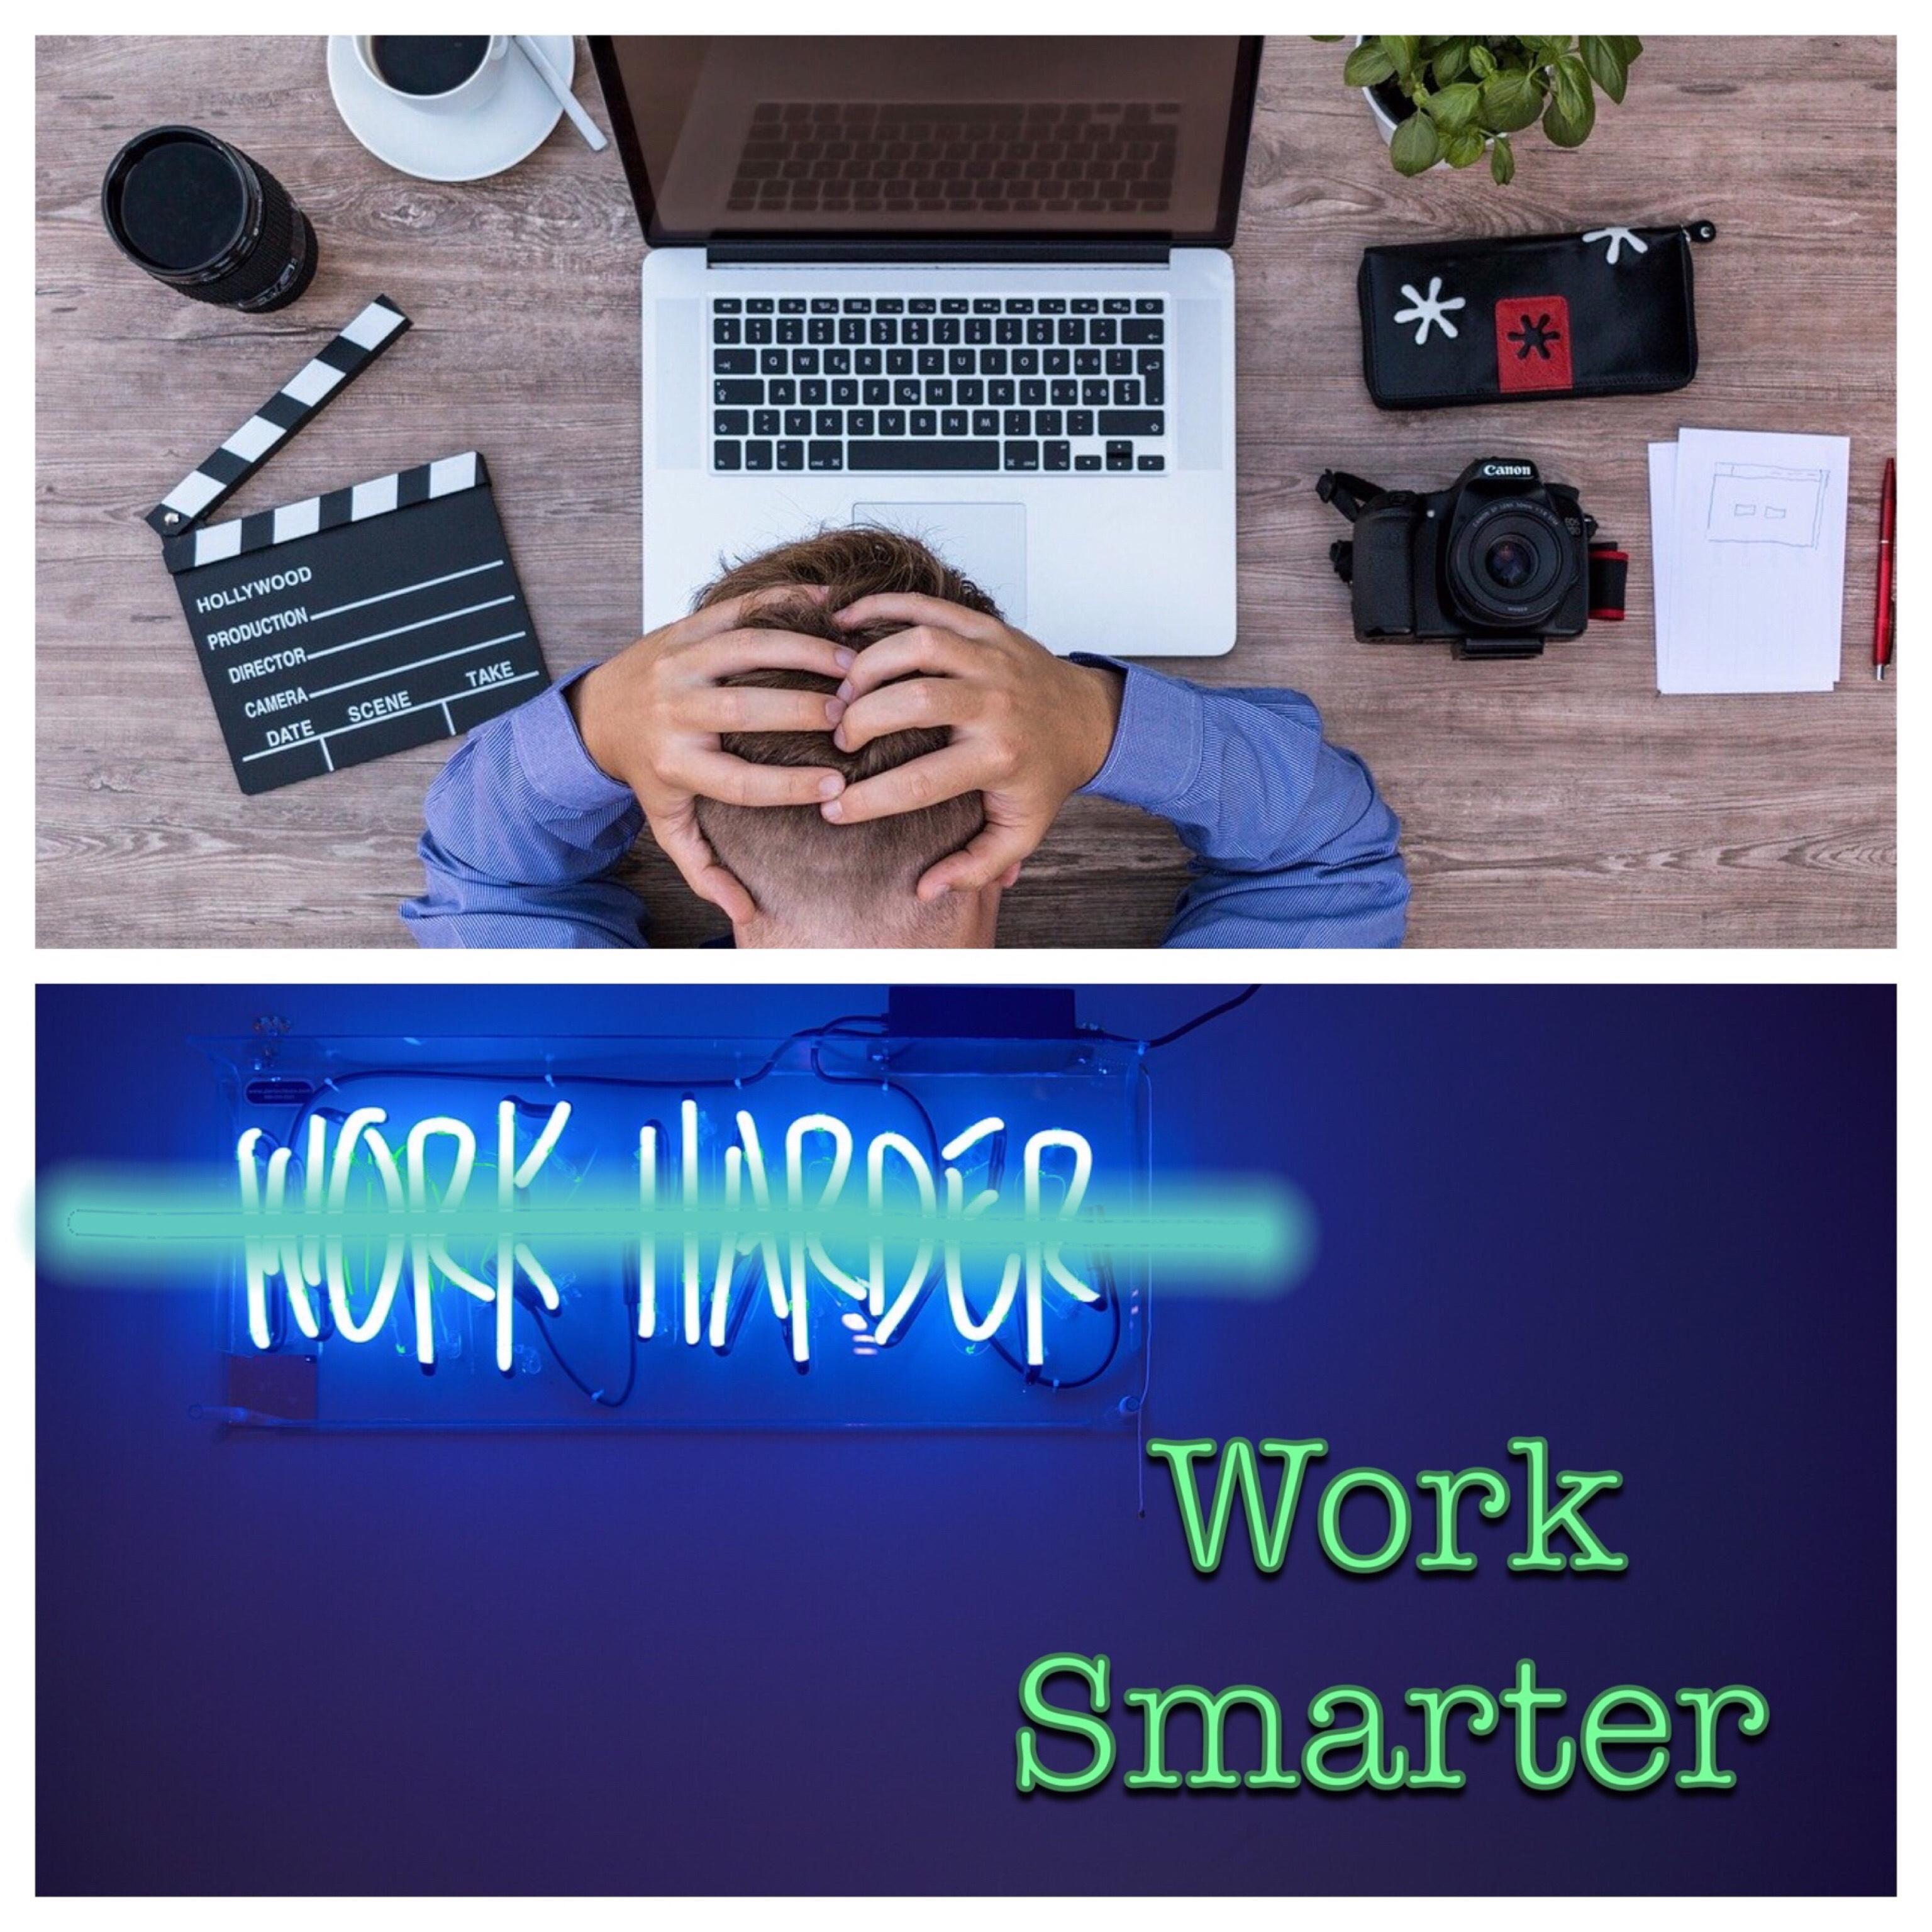 Work Smarter Logo (stressed man/ crossed out work harder)